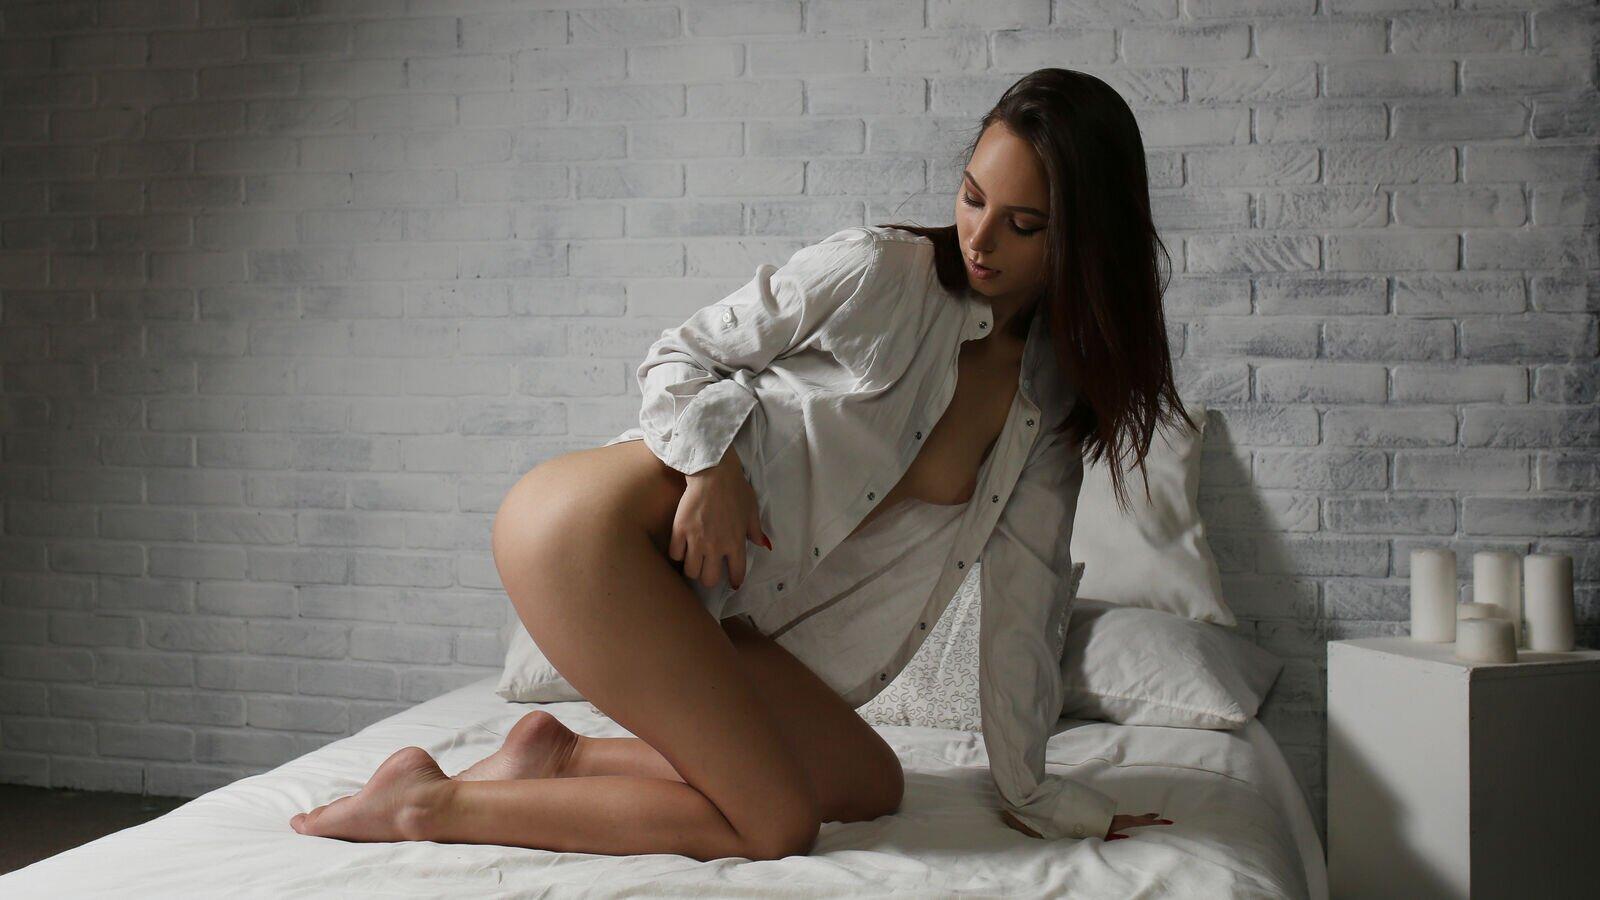 ChristinHall